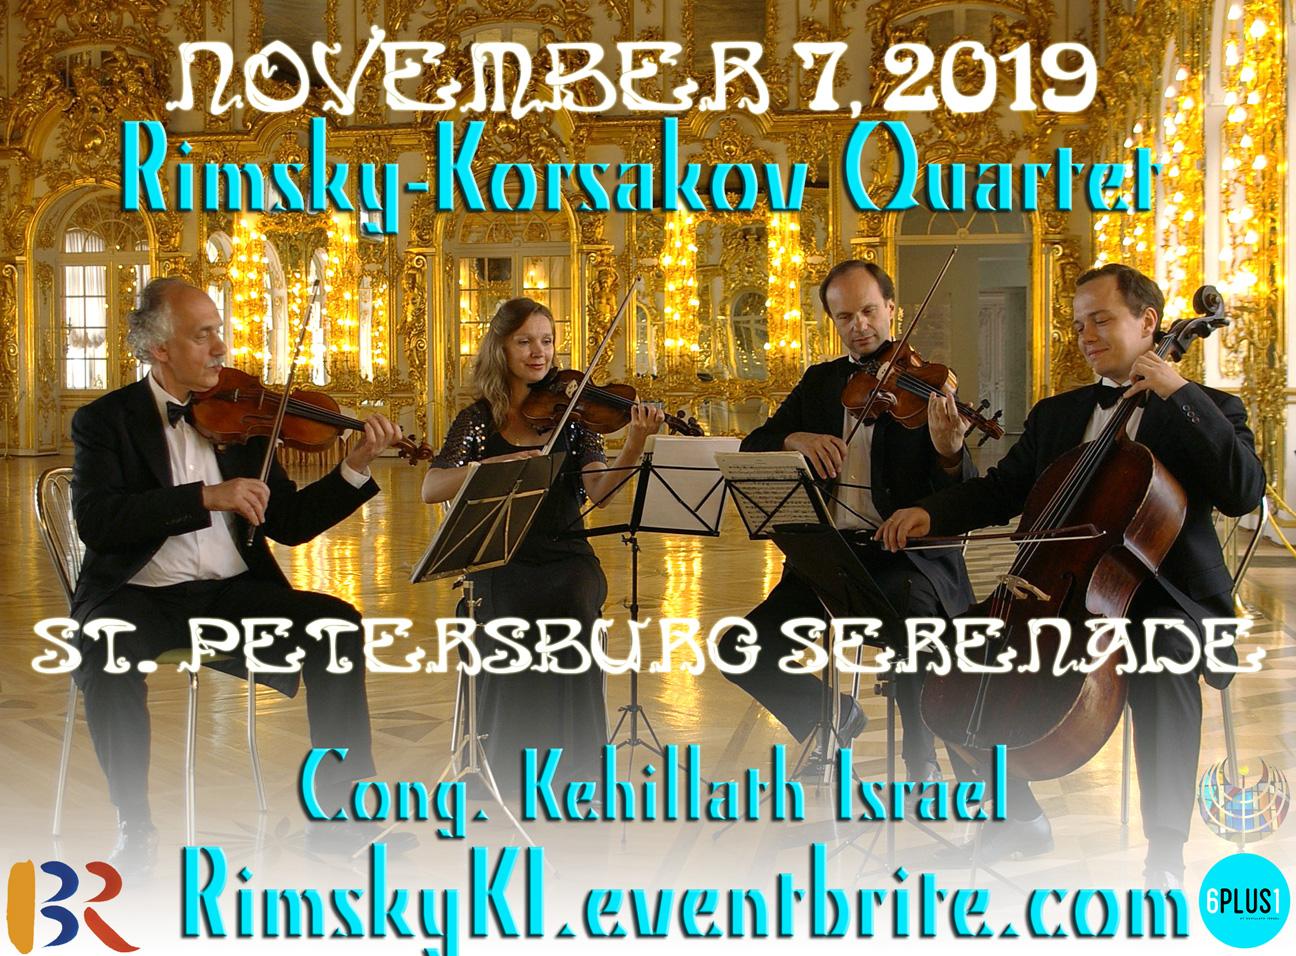 St Petersburg Serenade: Rimsky-Korsakov Quartet in Concert